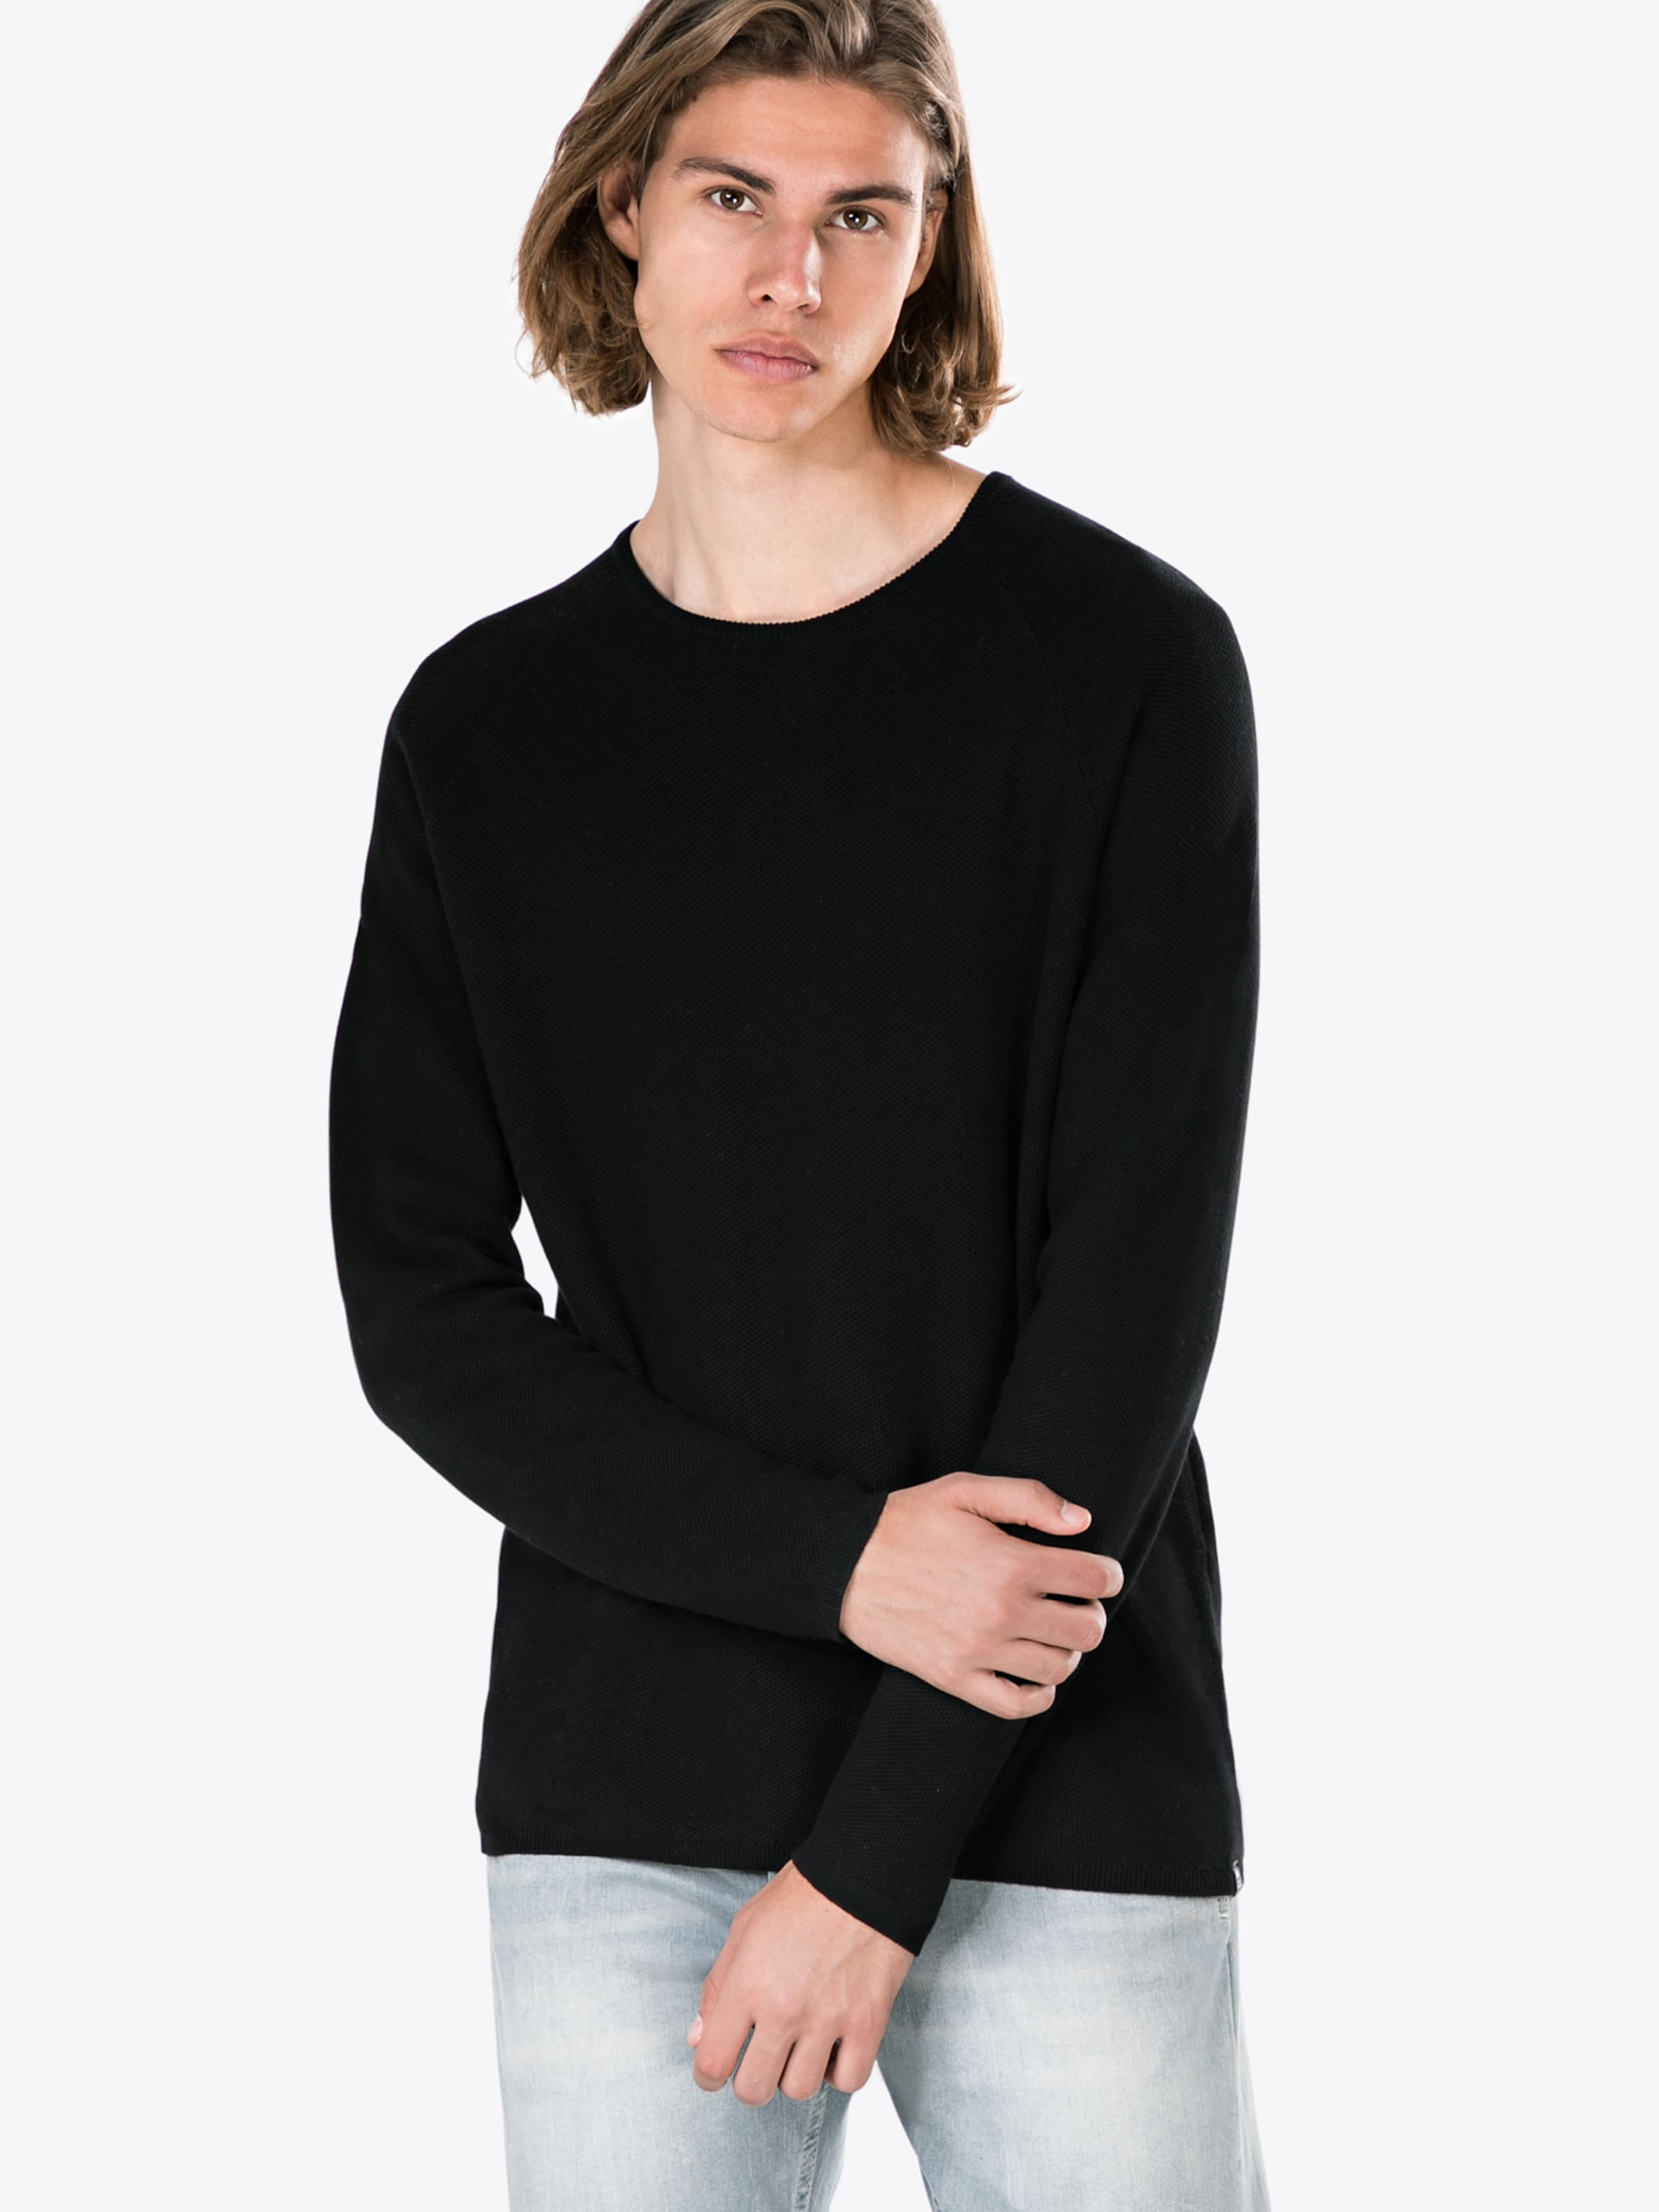 Pullover Schwarz In Revolution Pullover Revolution In uK1cTJ3lF